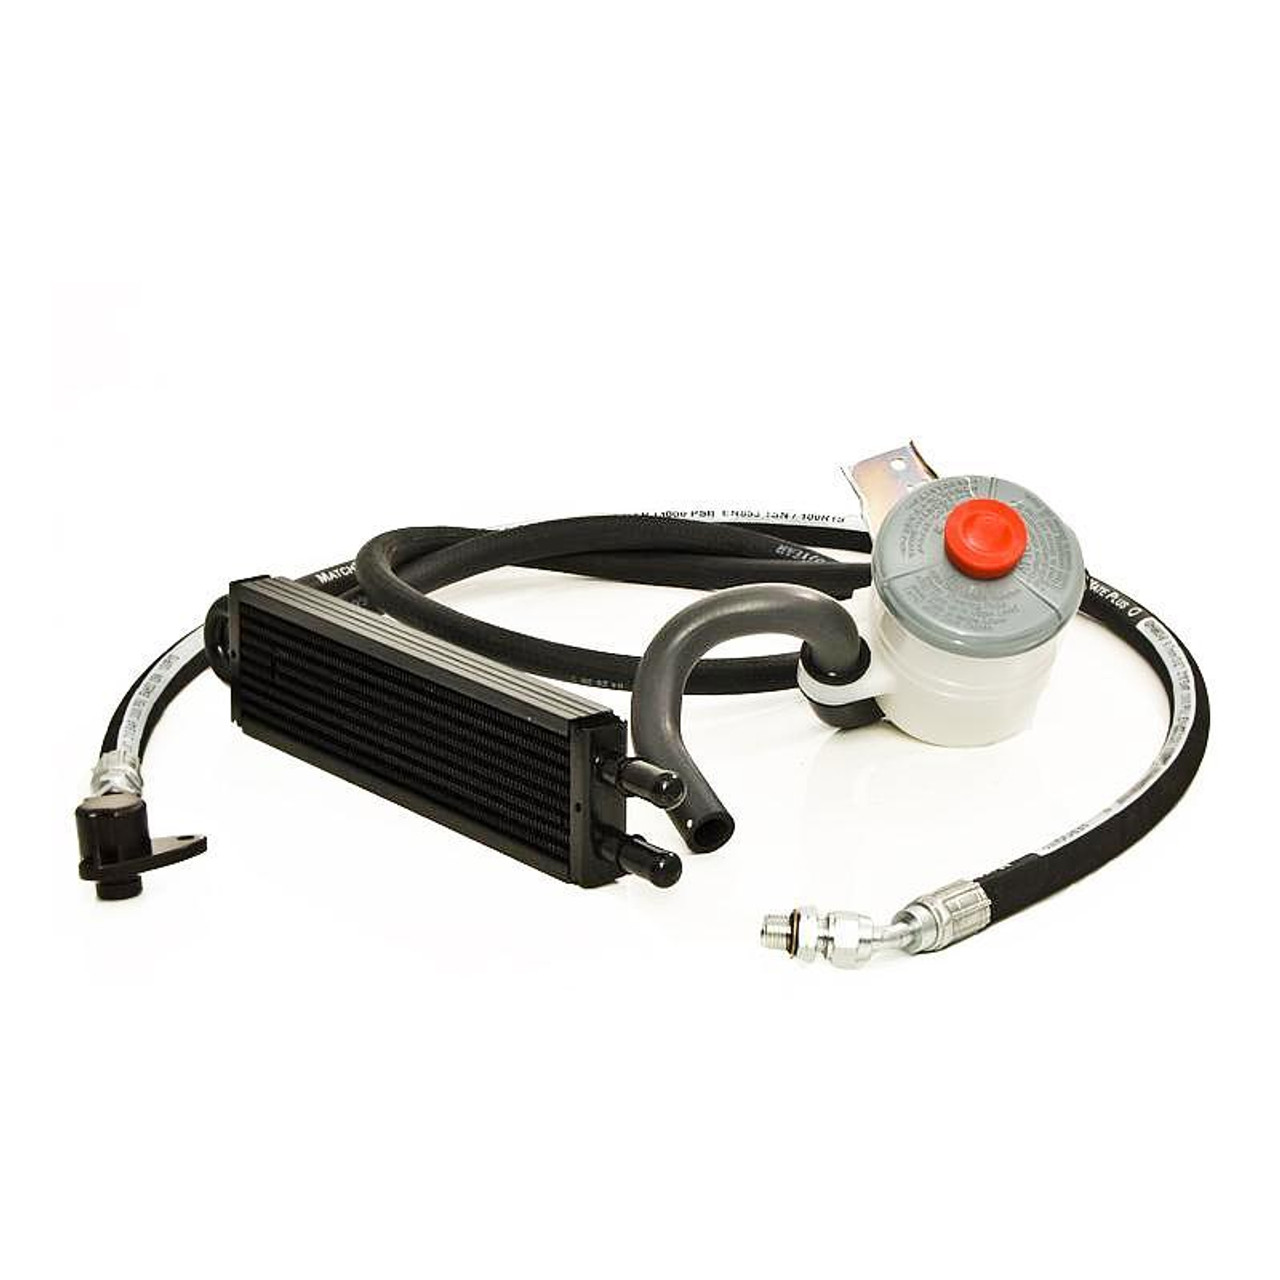 Hybrid Racing - RHD Power Steering Conversion Kit (92-00' Civic   94-01' on 4th gen prelude, red prelude, jdm honda prelude, 2011 honda prelude, rwd prelude,